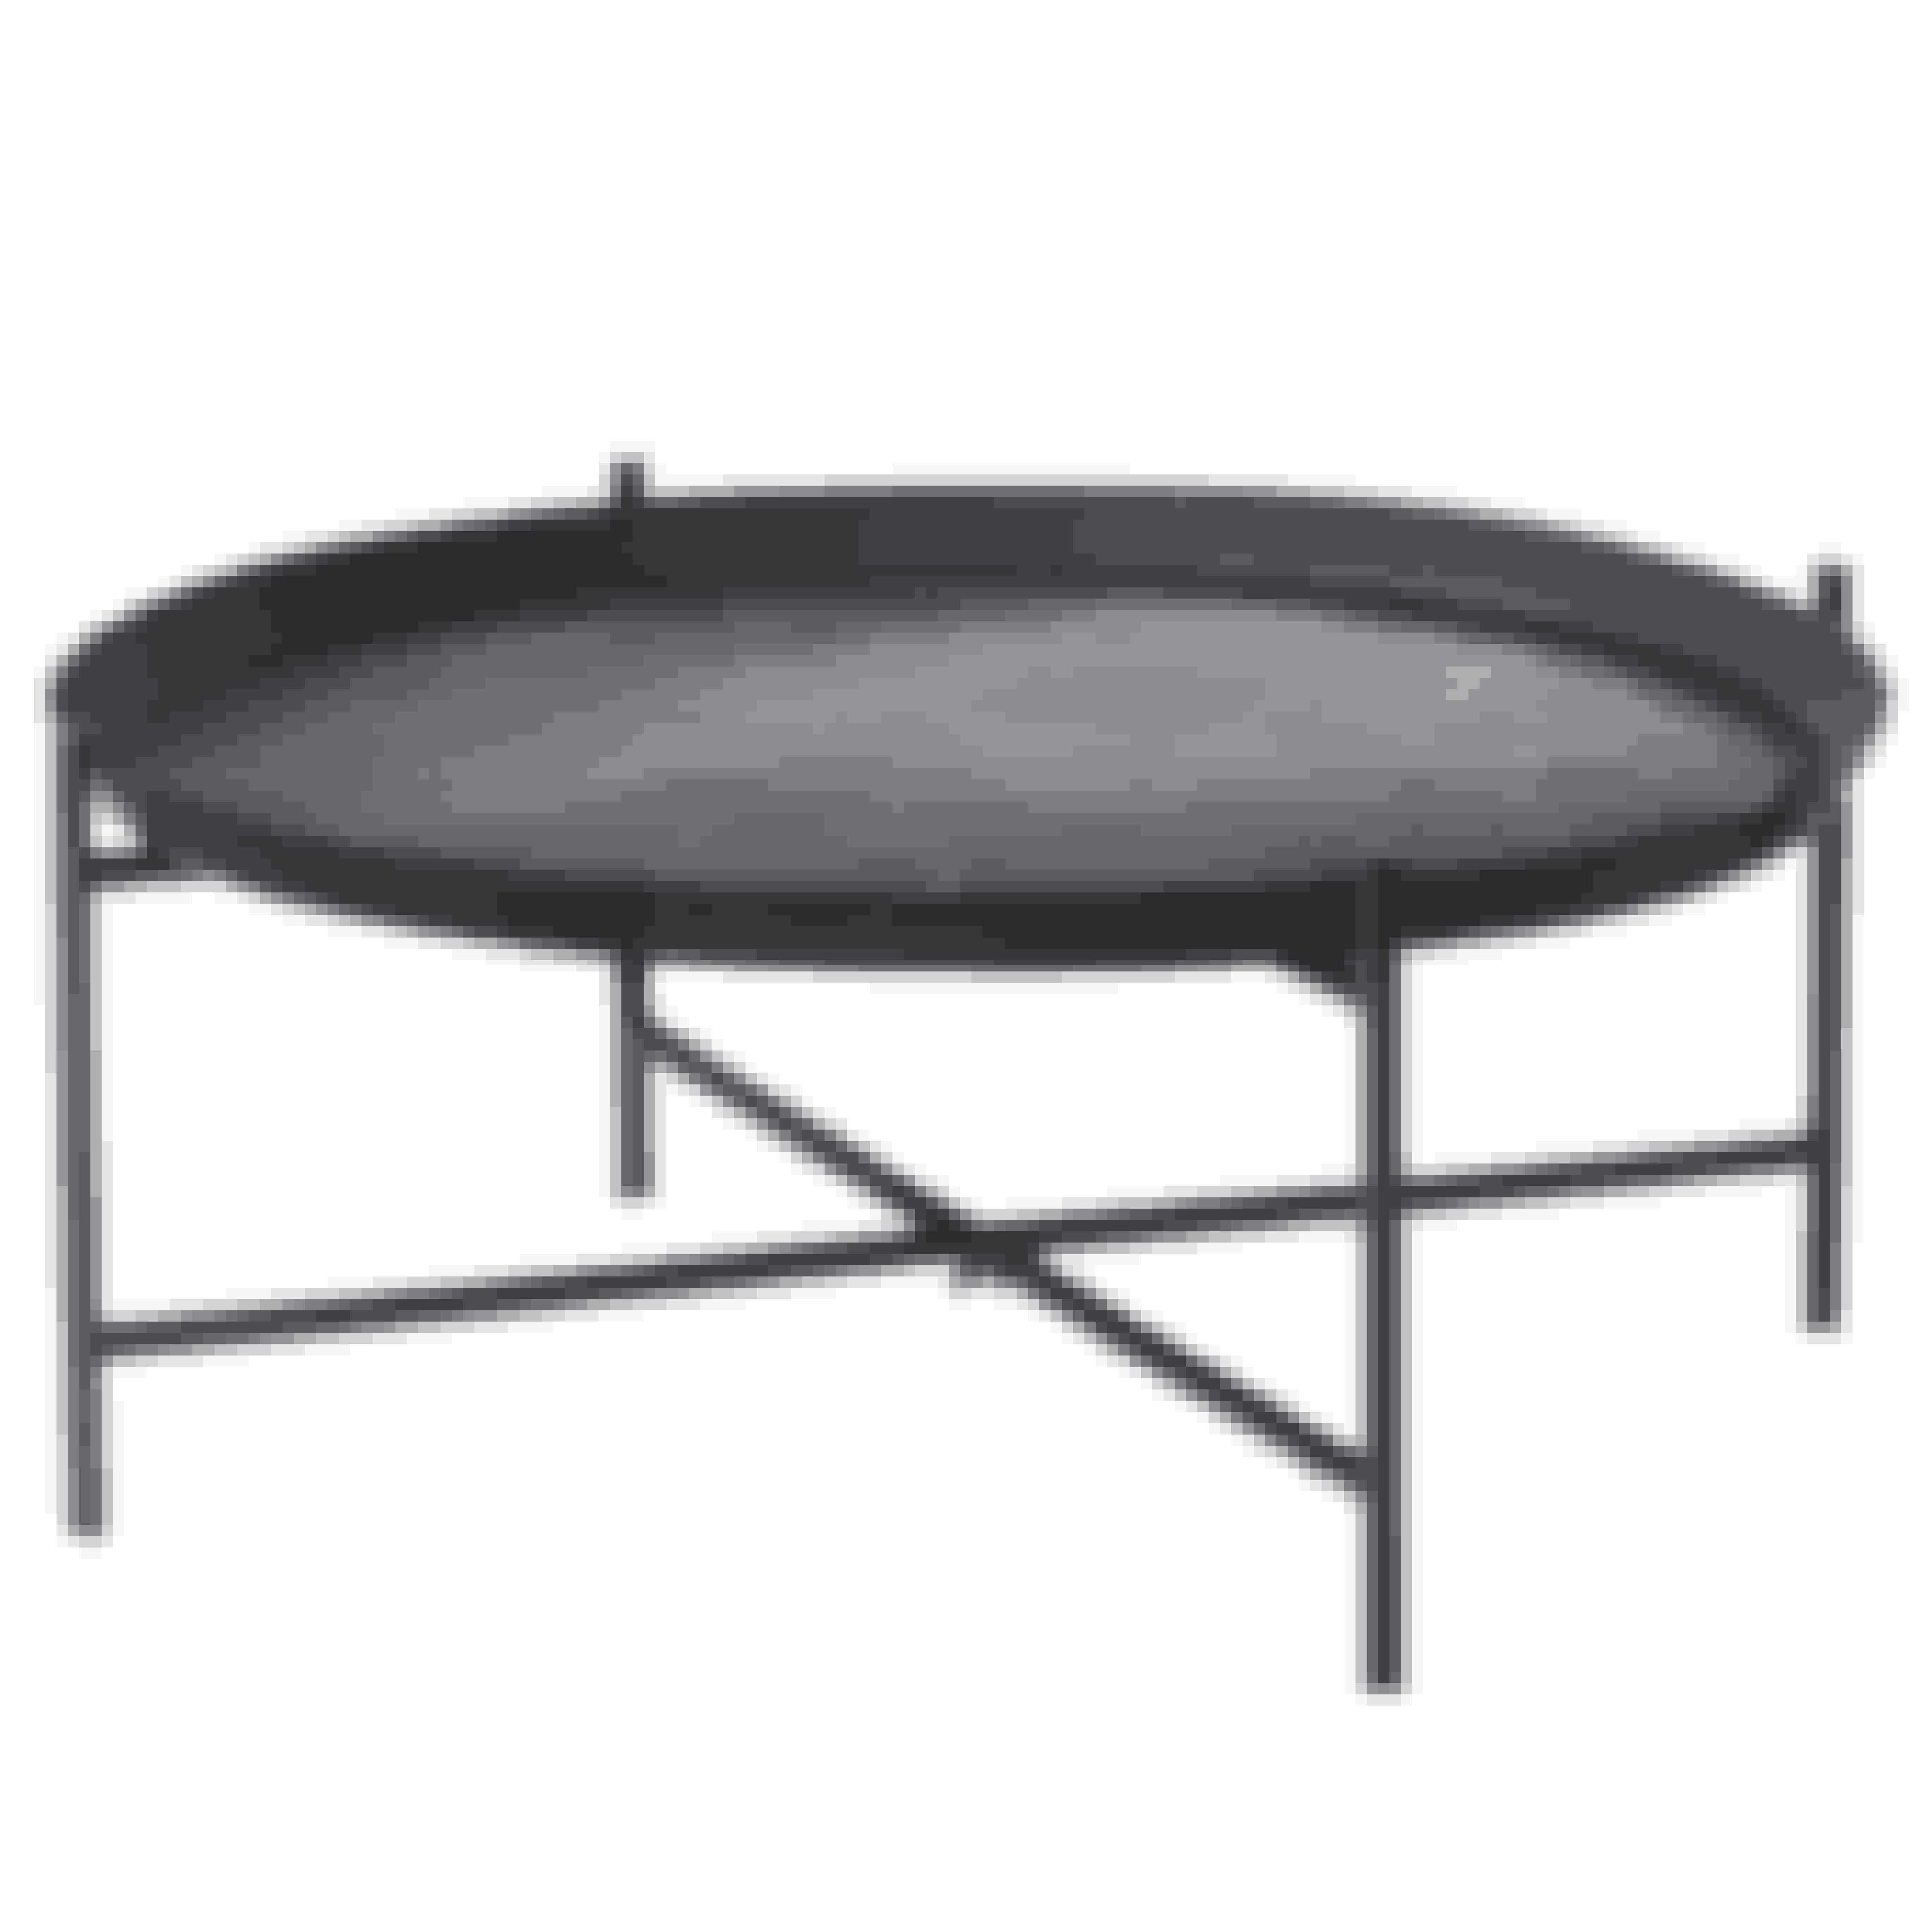 Sofabord, Svärtan, h 30 cm, diam. 73 cm, 699 kr. Ikea.com